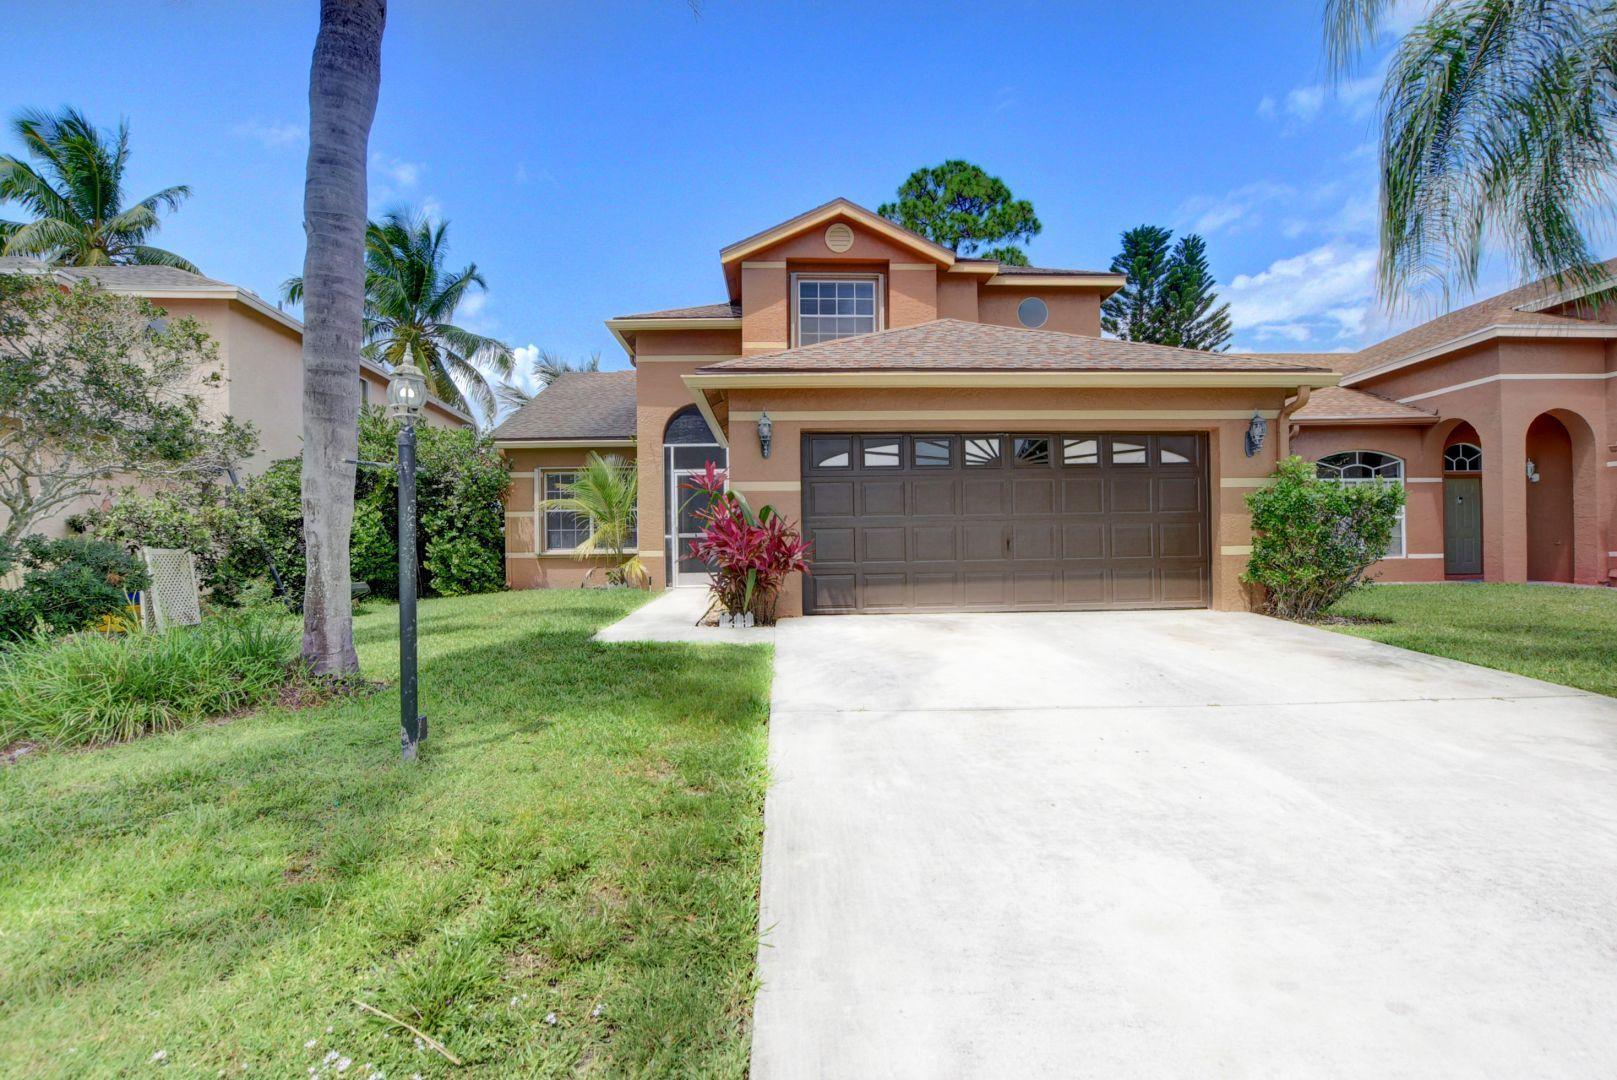 Photo of 108 Heatherwood Drive, Royal Palm Beach, FL 33411